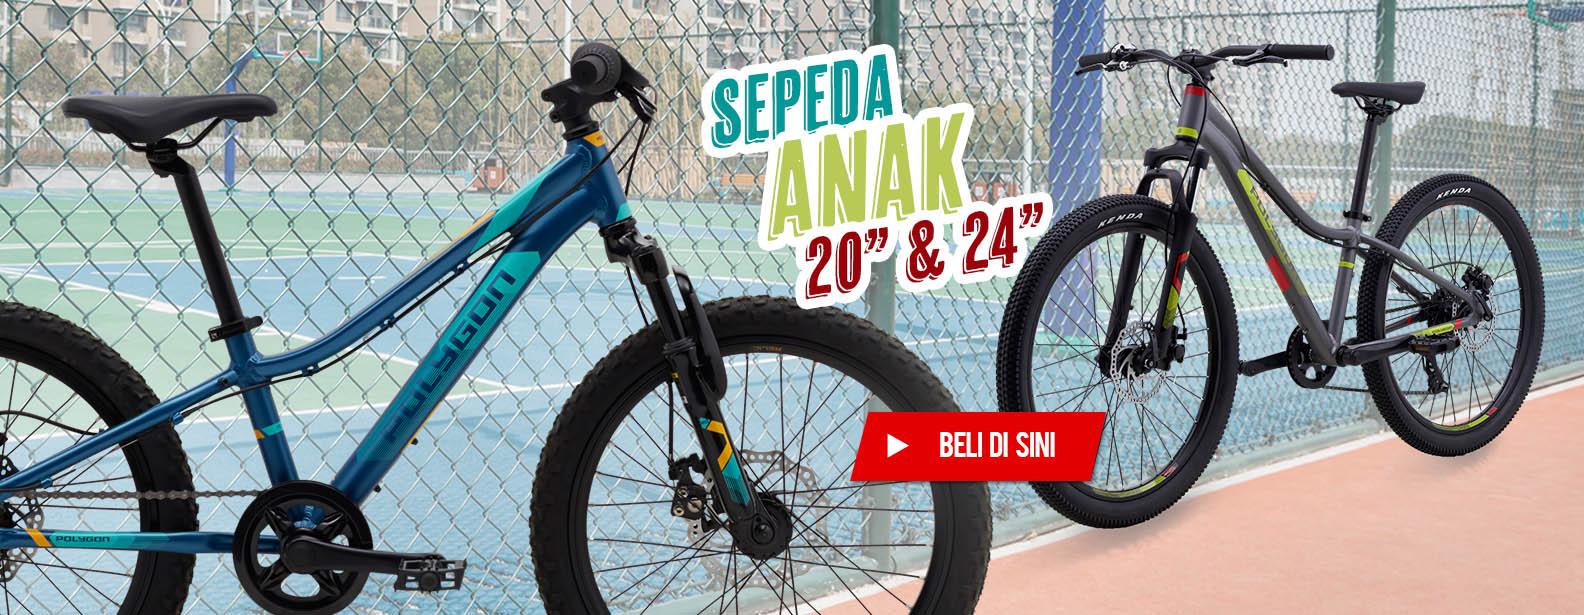 "Polygon Sepeda Anak 20"" & 24"""